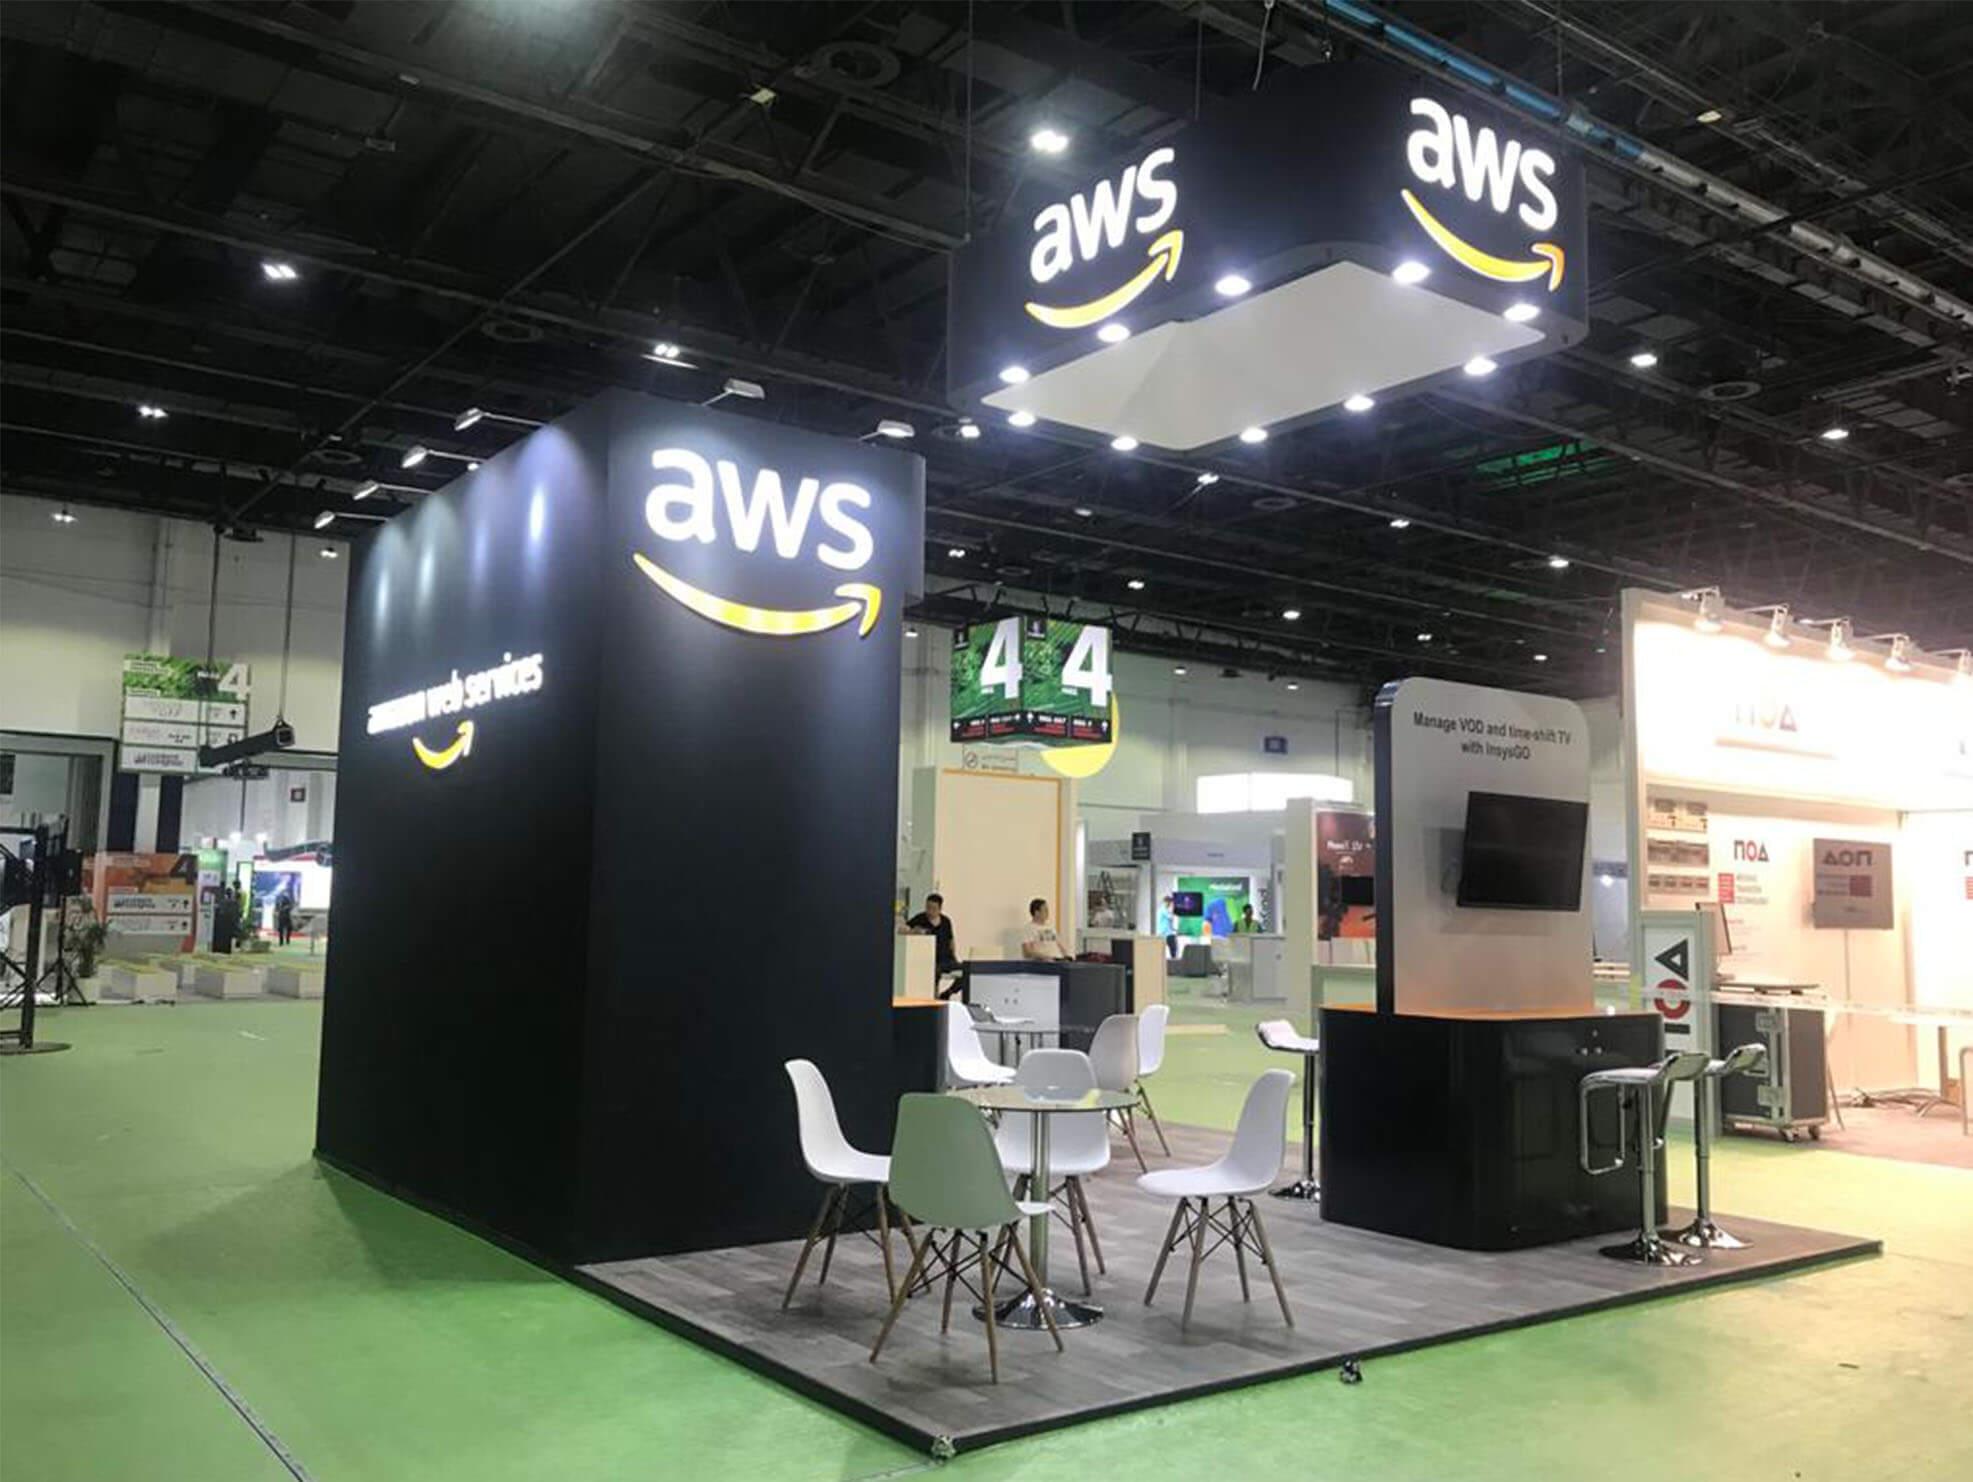 Amazon's trade show booth design